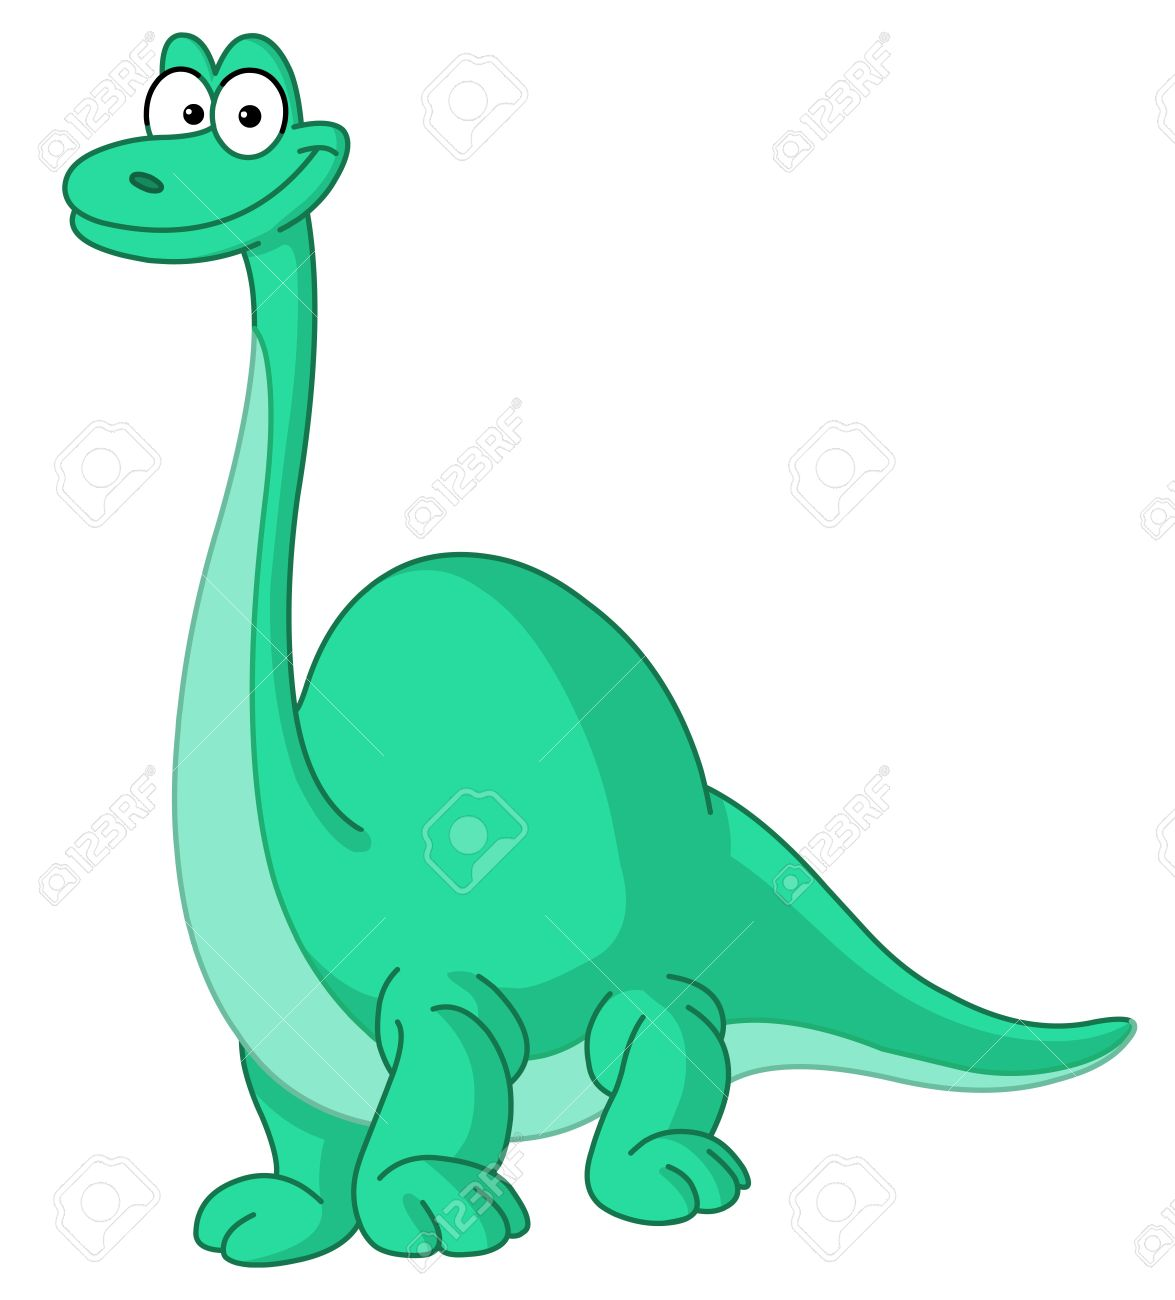 Brachiosaurus clipart #15, Download drawings